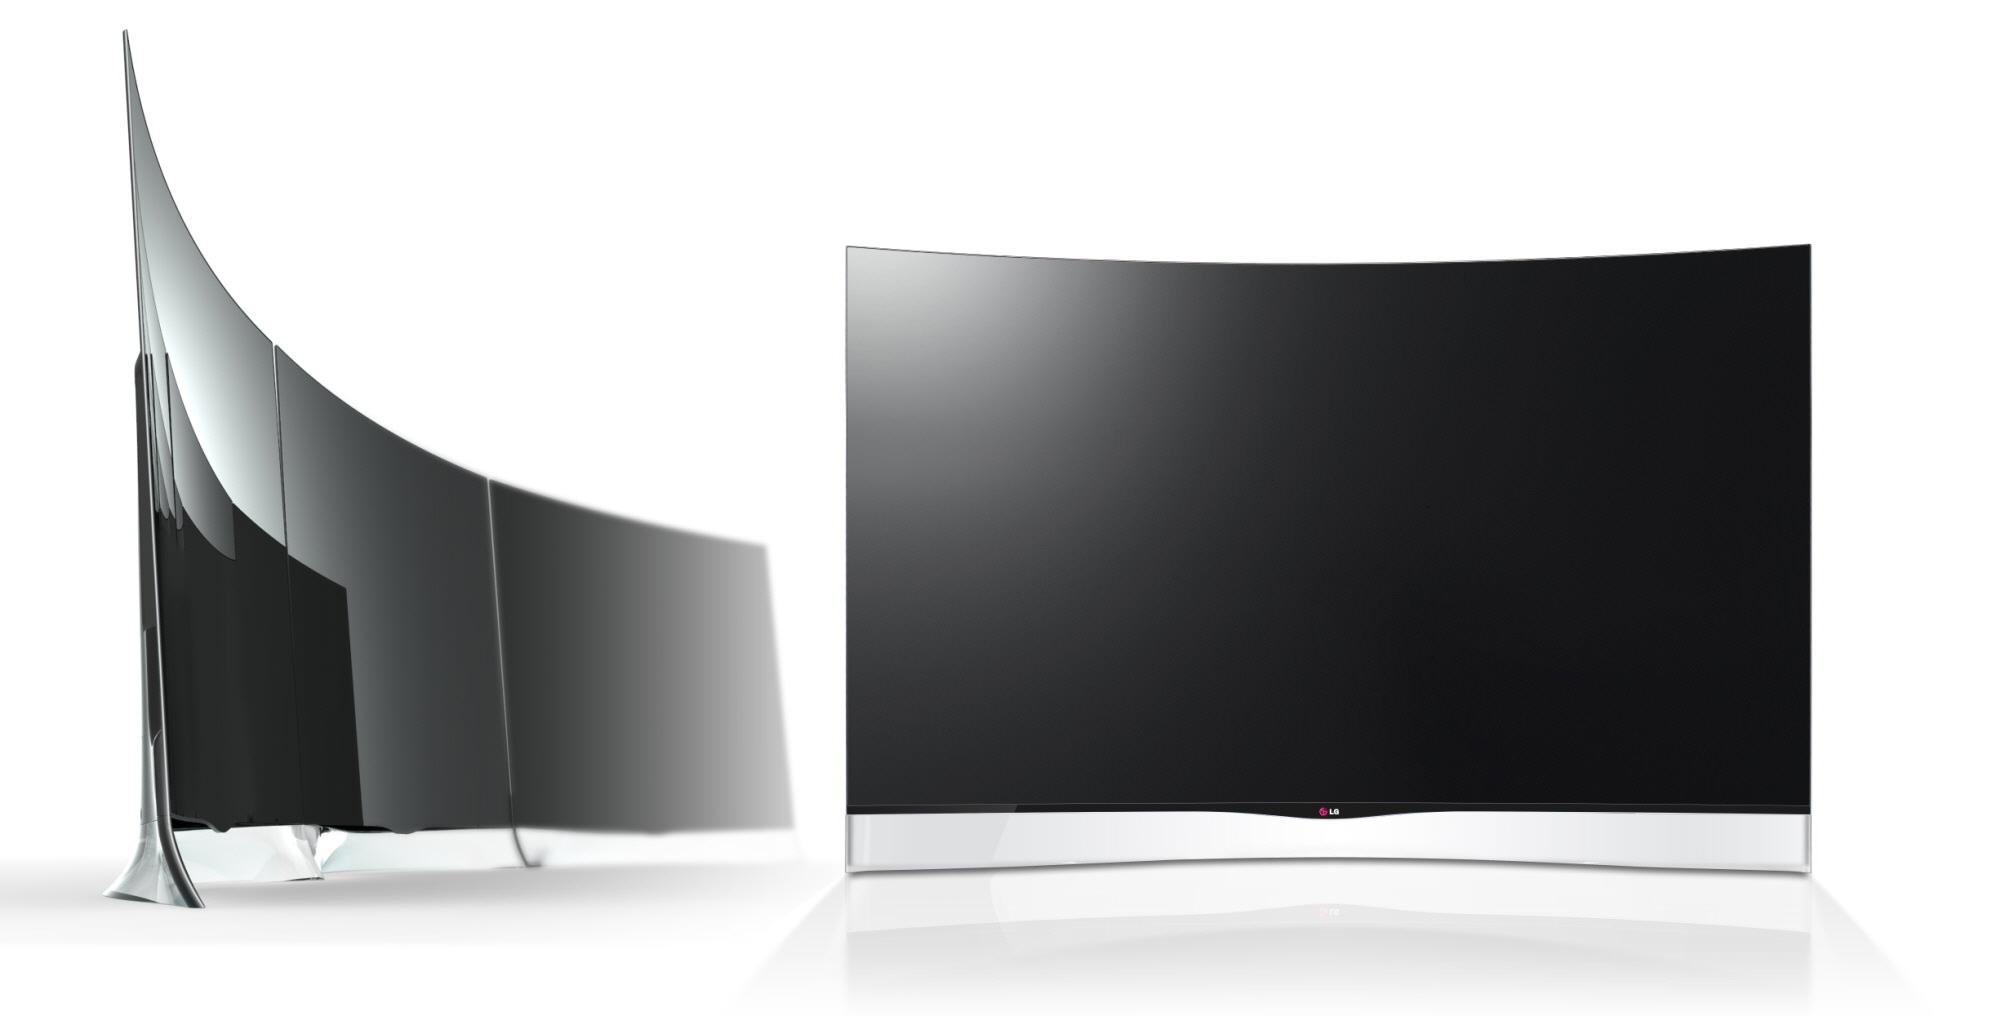 Diode Emitting Tv Light